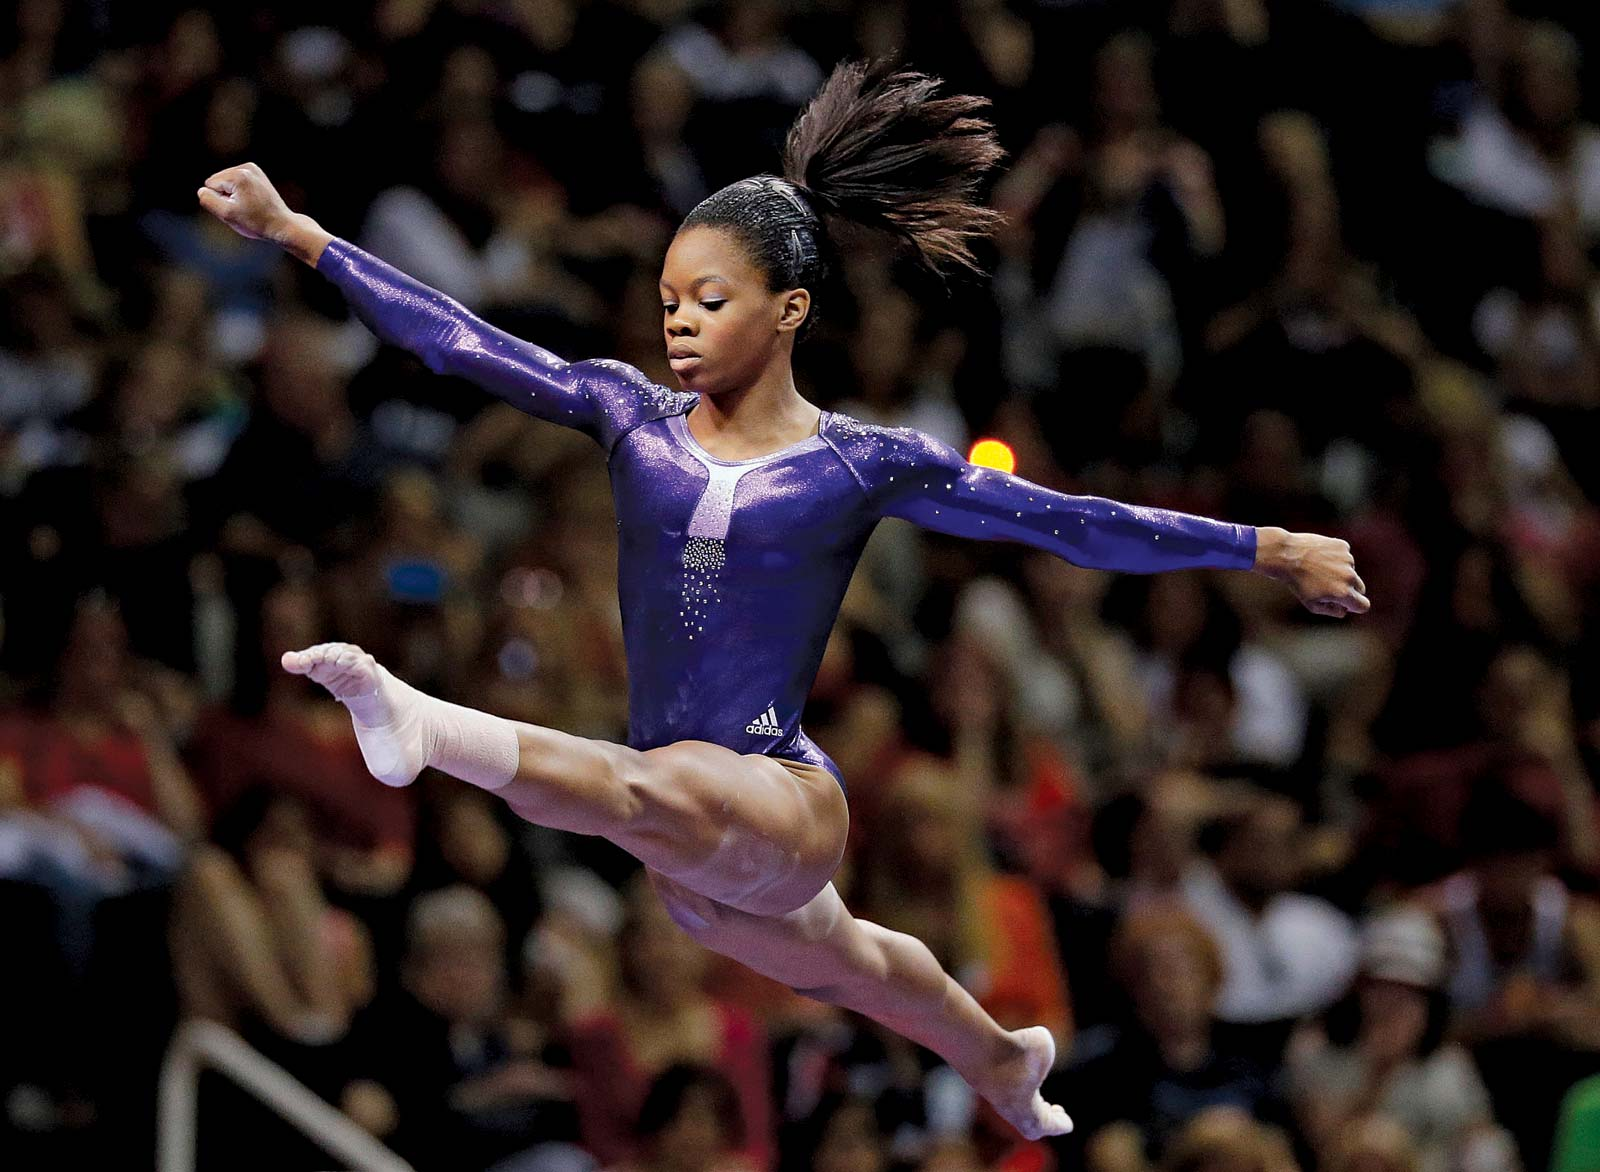 The History Of Artistic Gymnastics